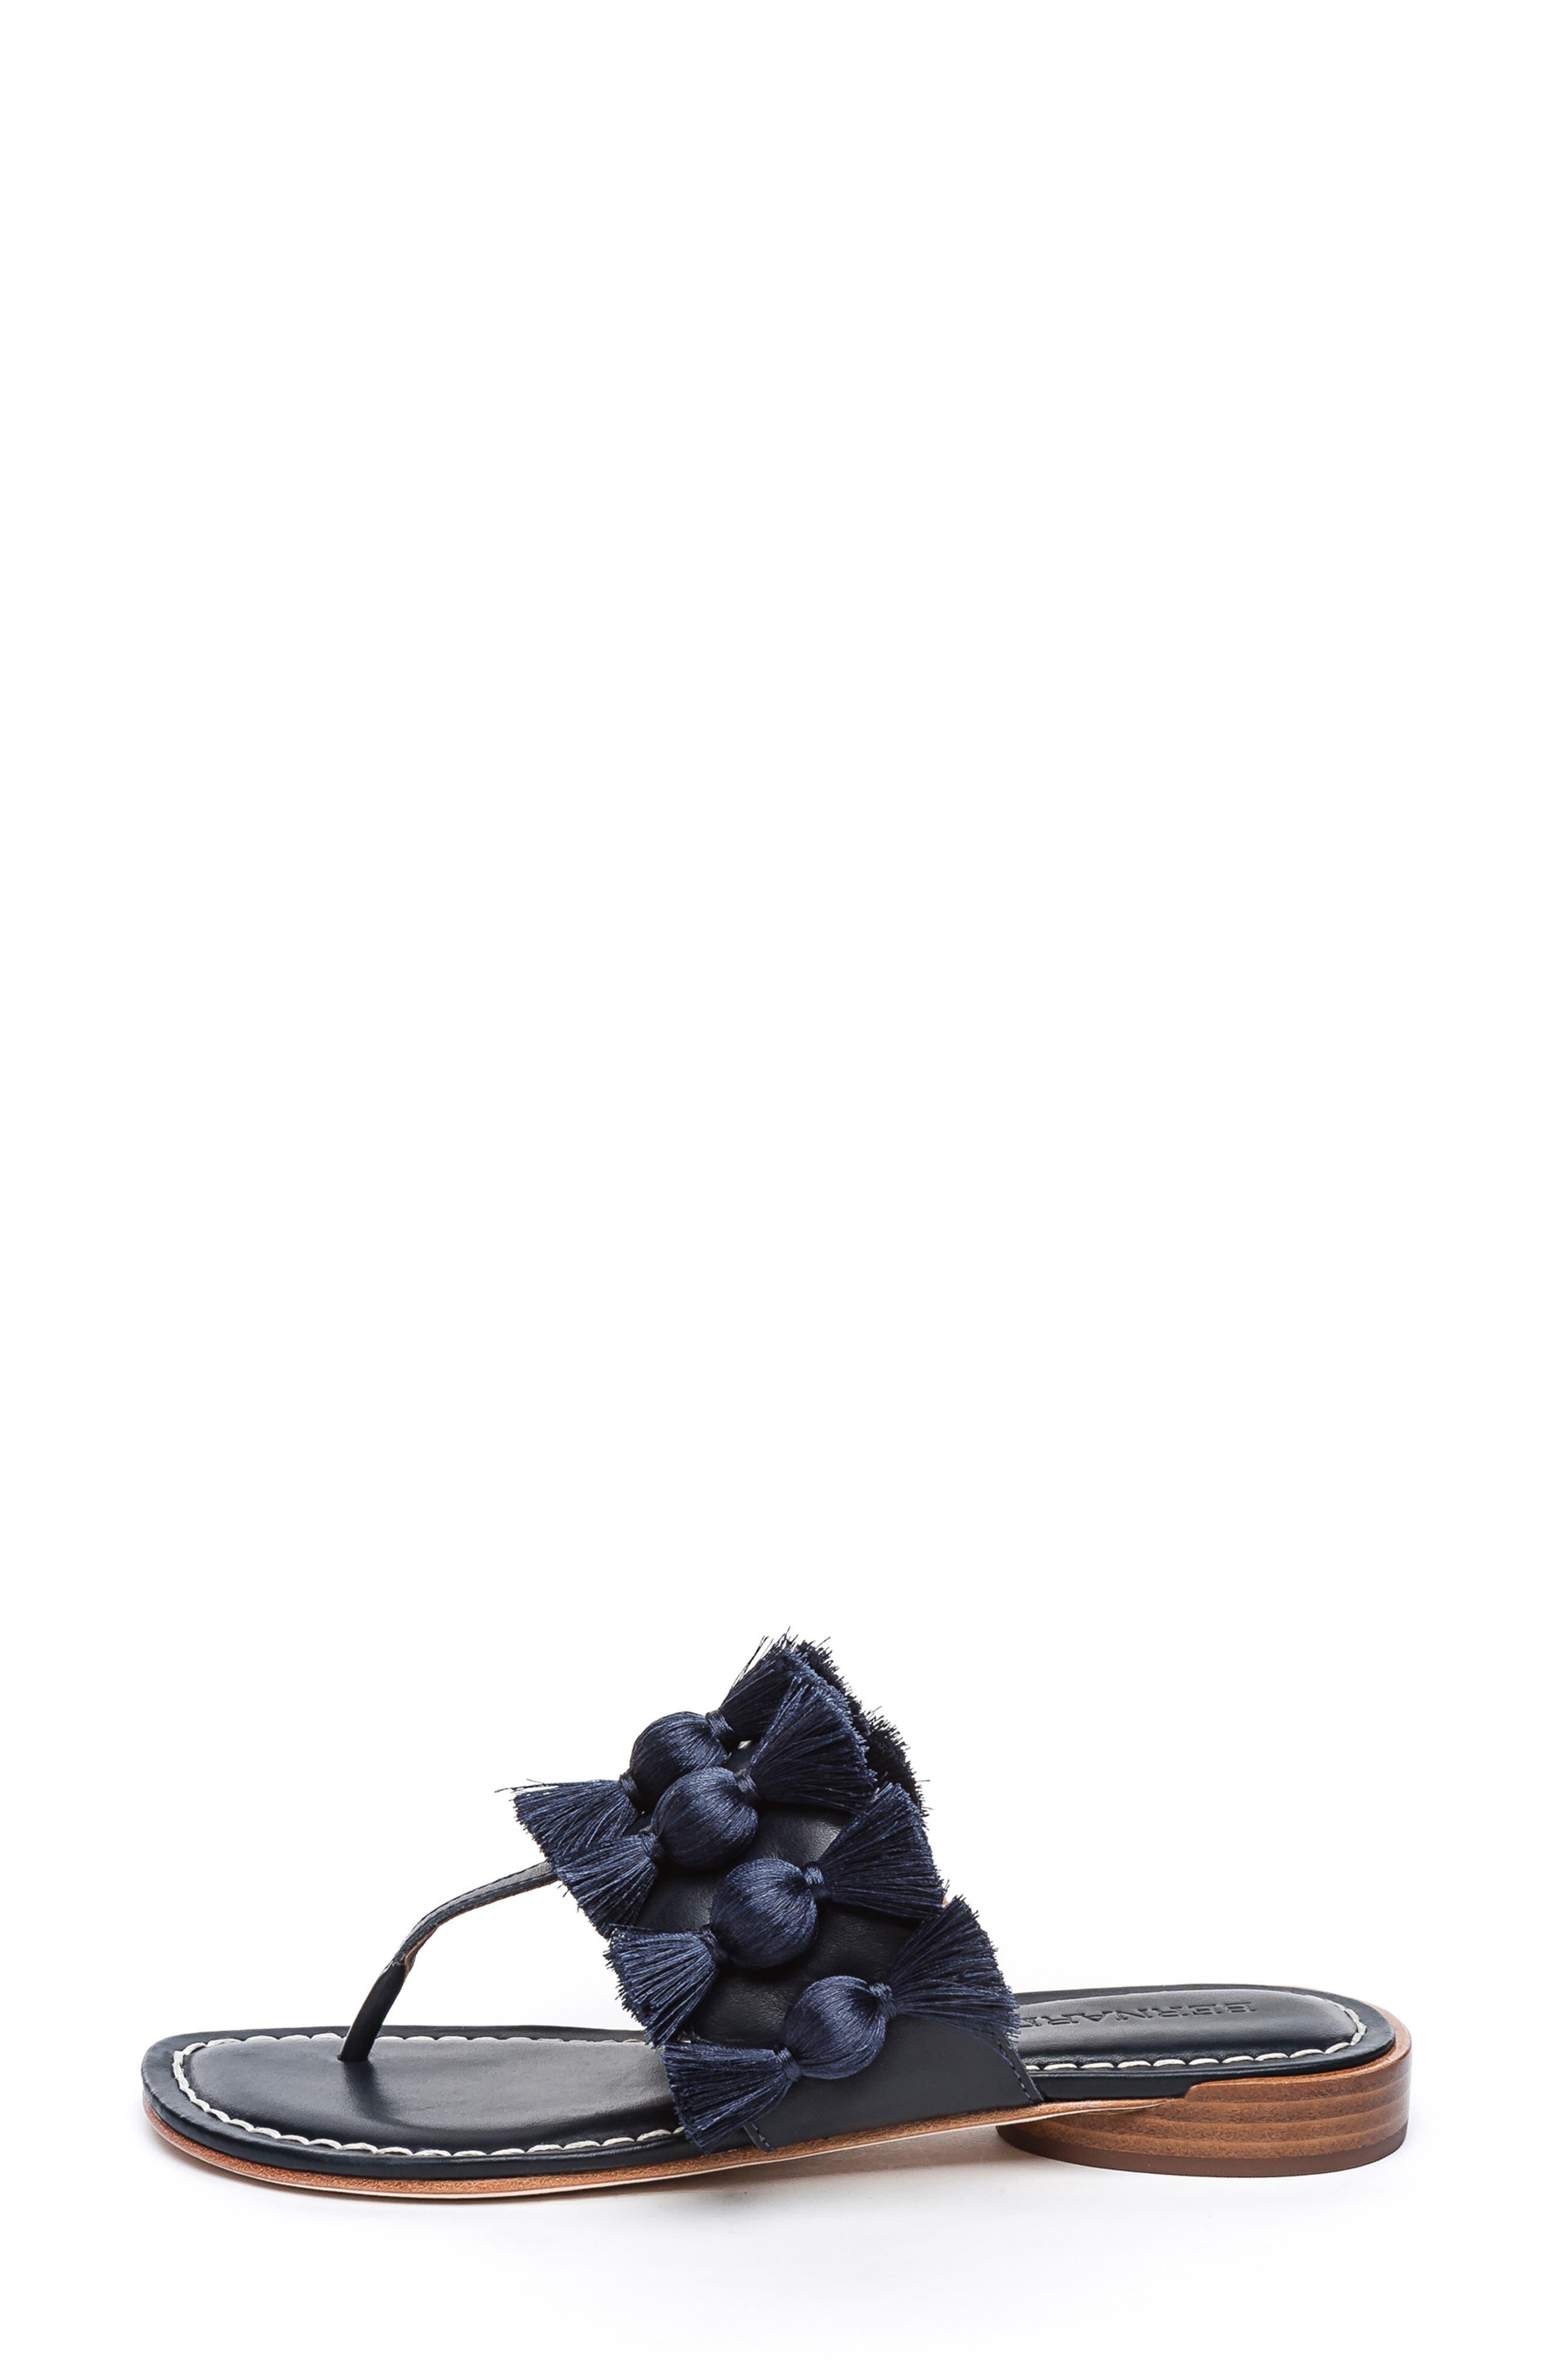 BERNARDO, Footwear Tara Flip Flop, Alternate thumbnail 3, color, NAVY ANTIQUE LEATHER